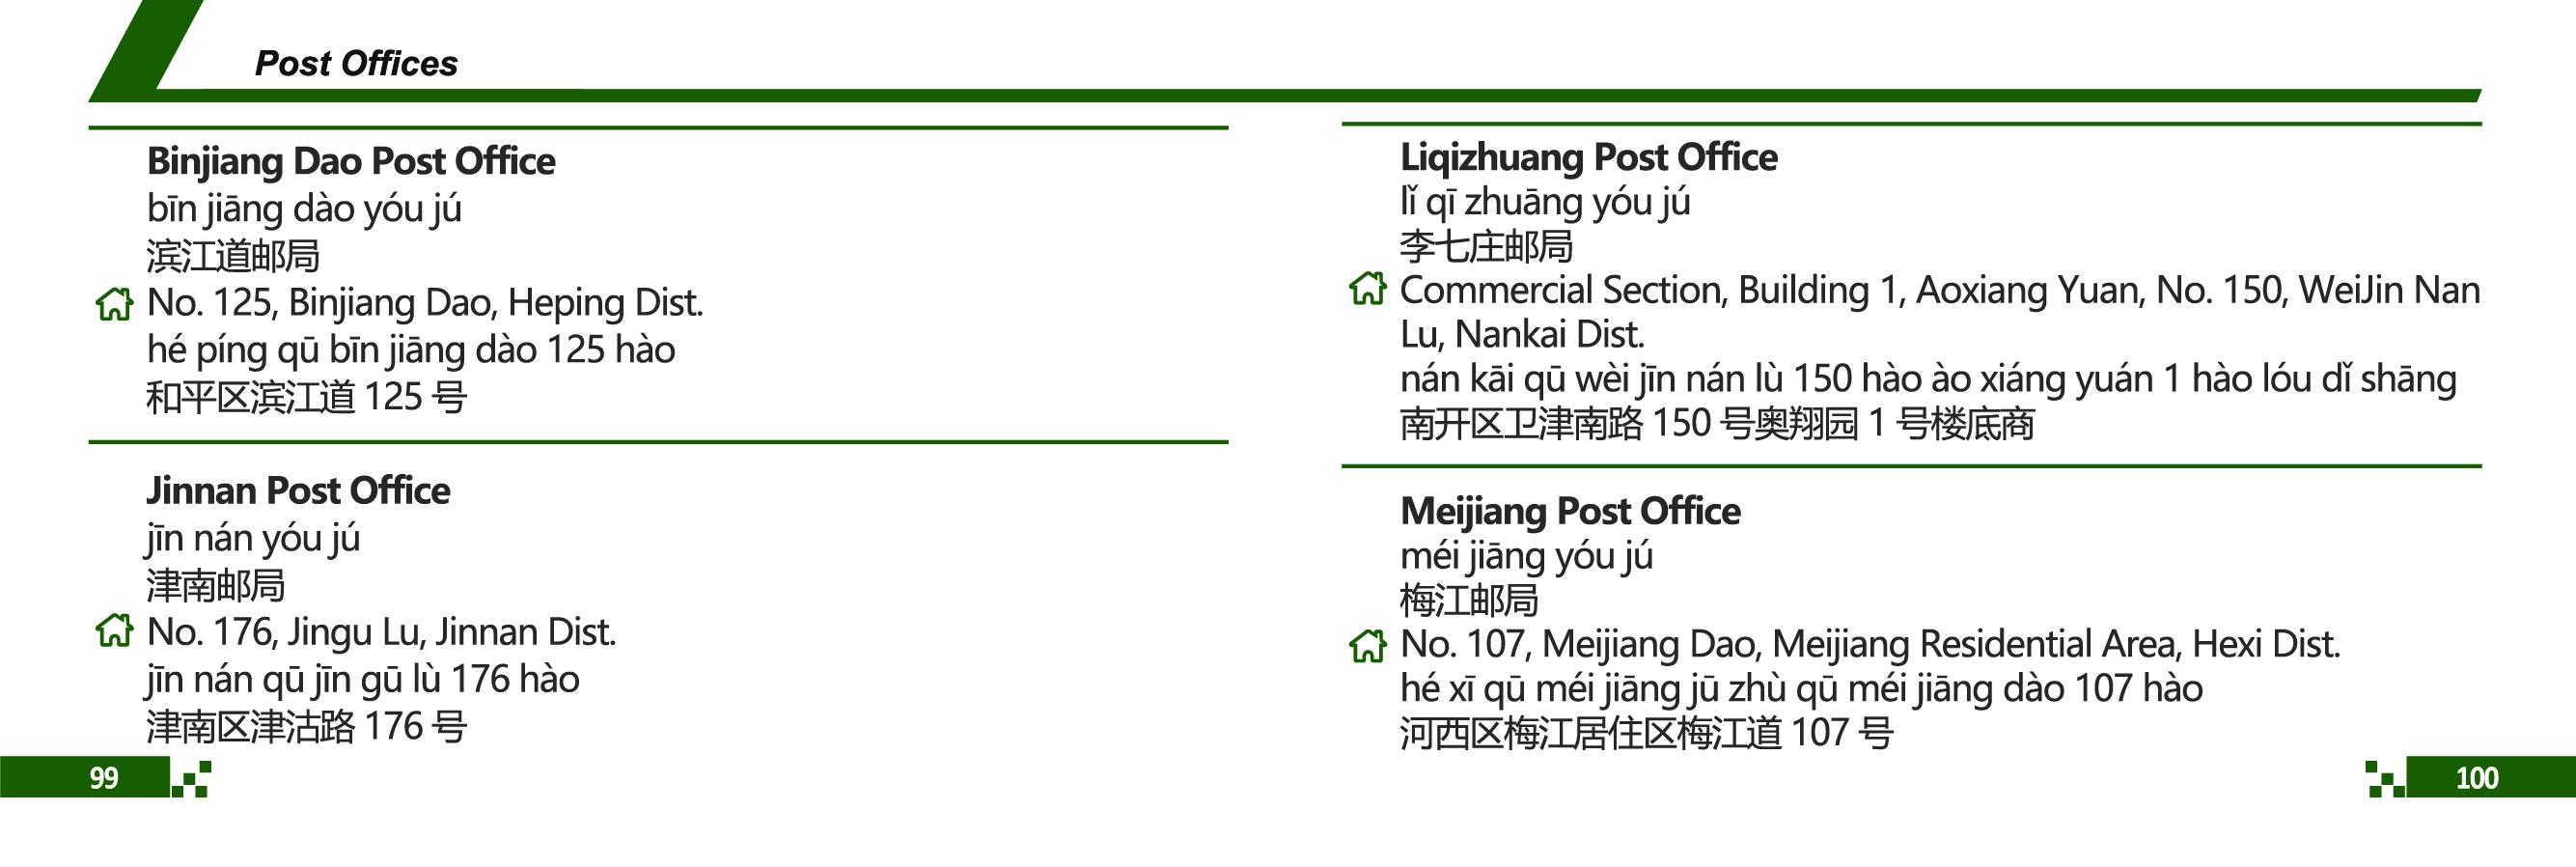 小册A1市区PostOffice-02